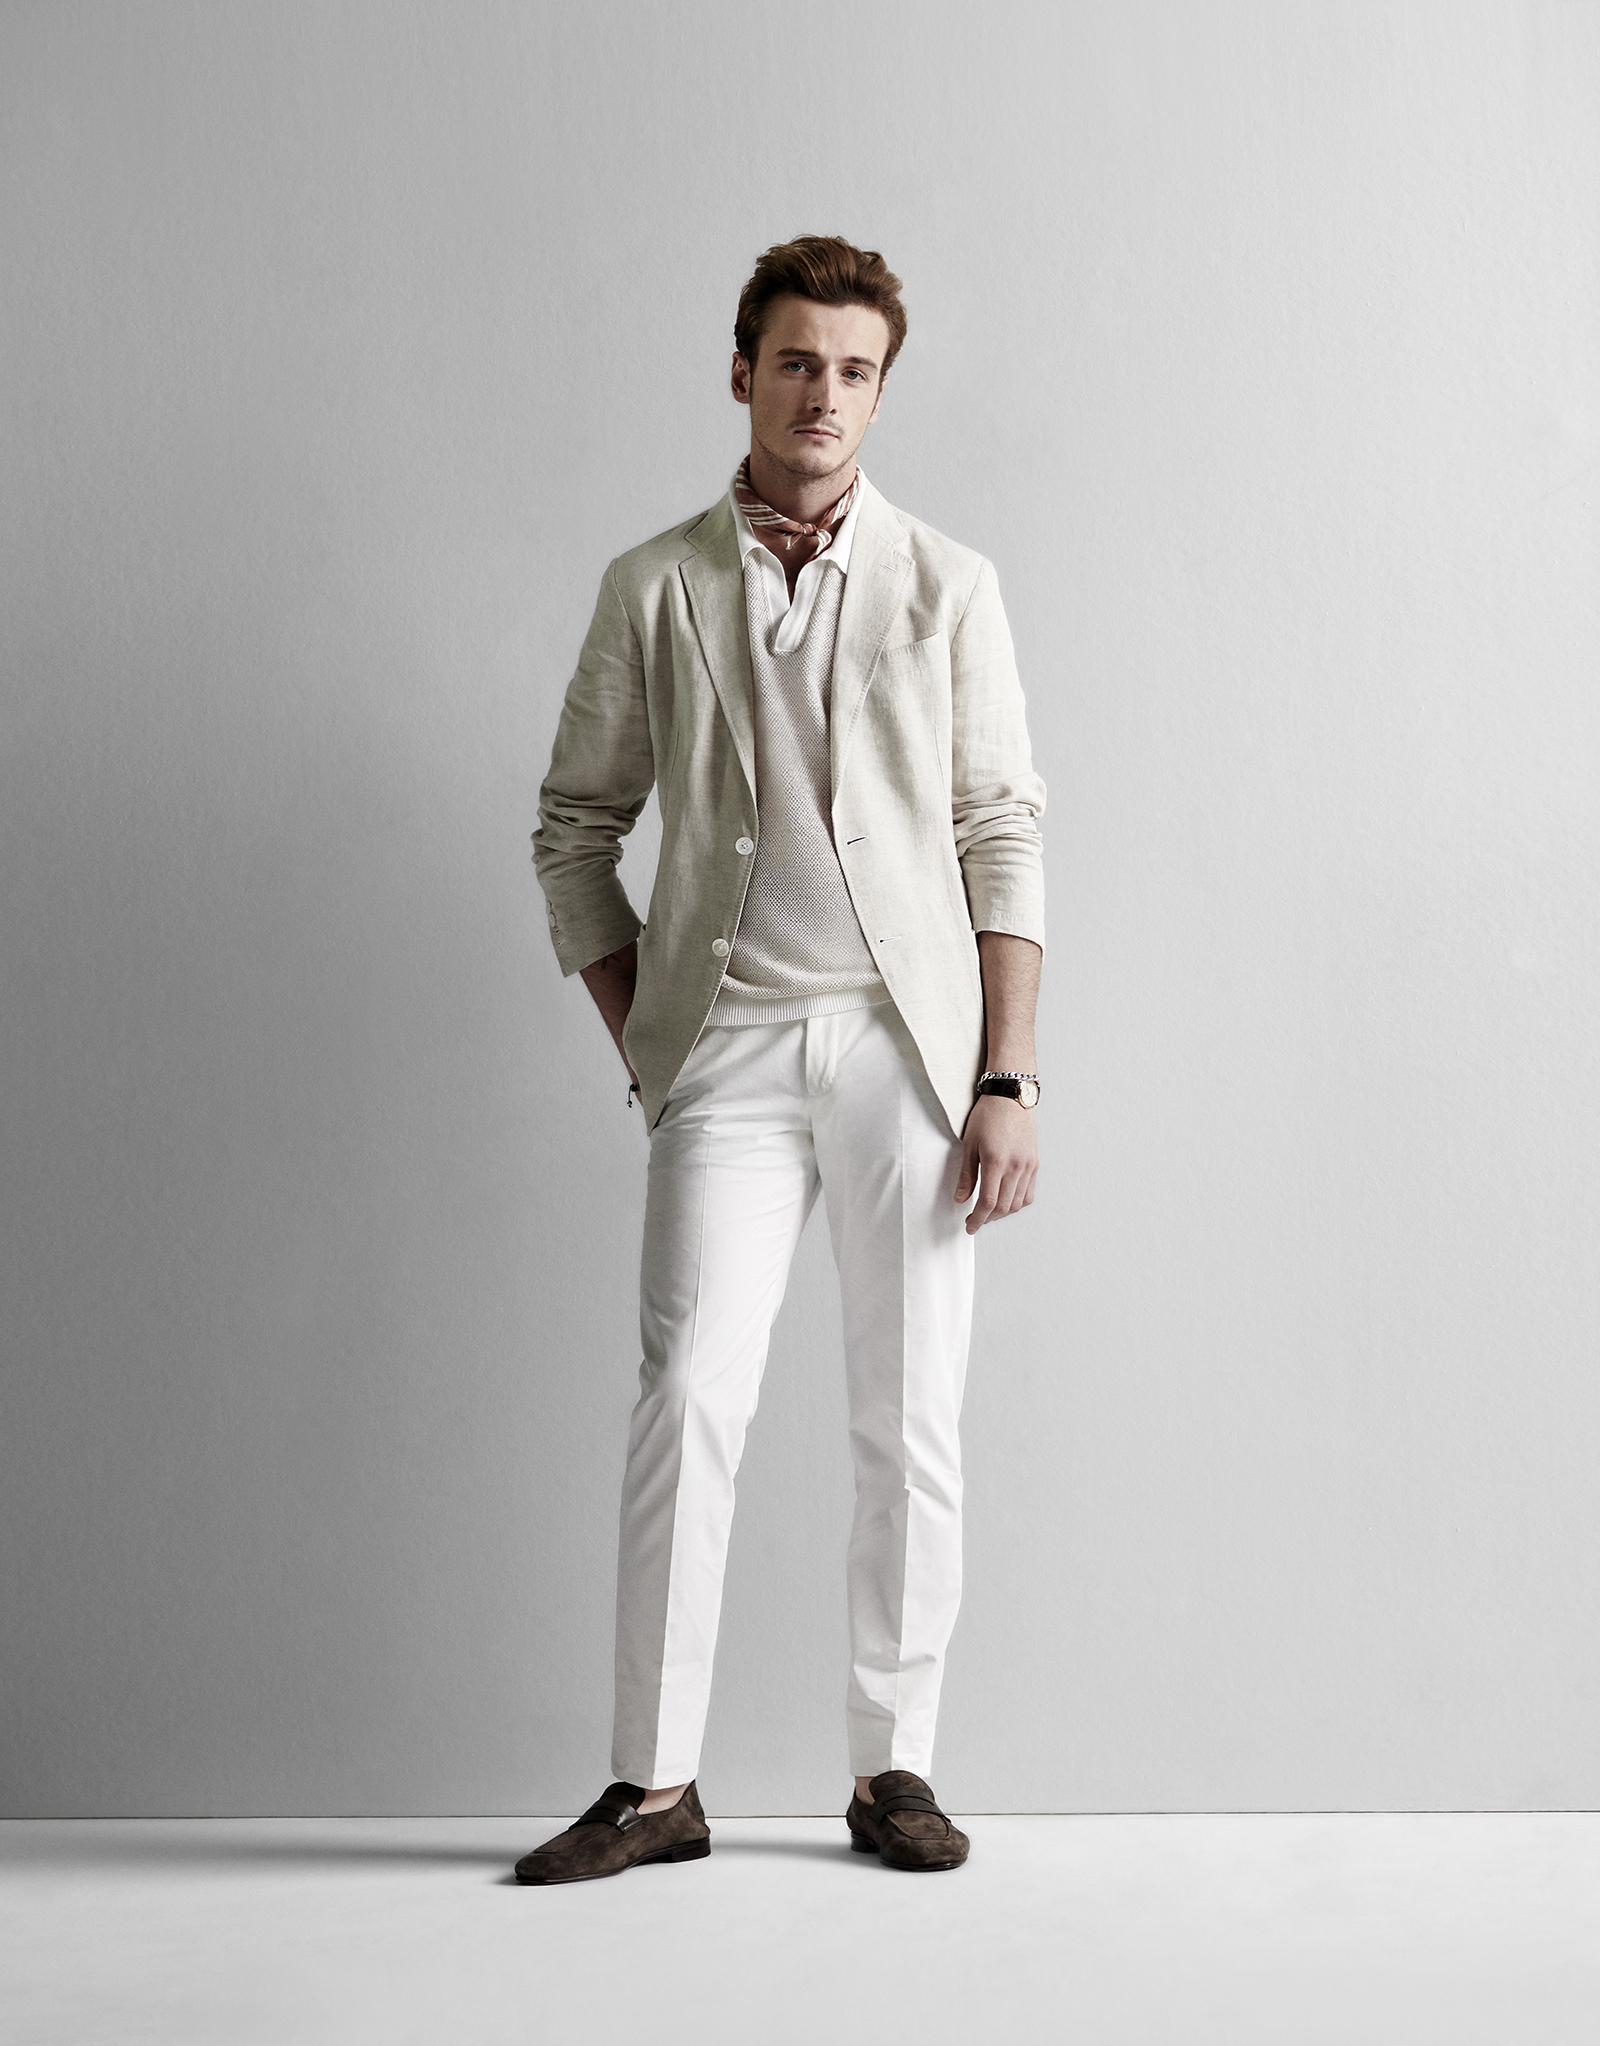 q1902_MAG_Mens_Tailoring_Mezibov_RGB_Zenga_Tailoring_015_v3.jpg